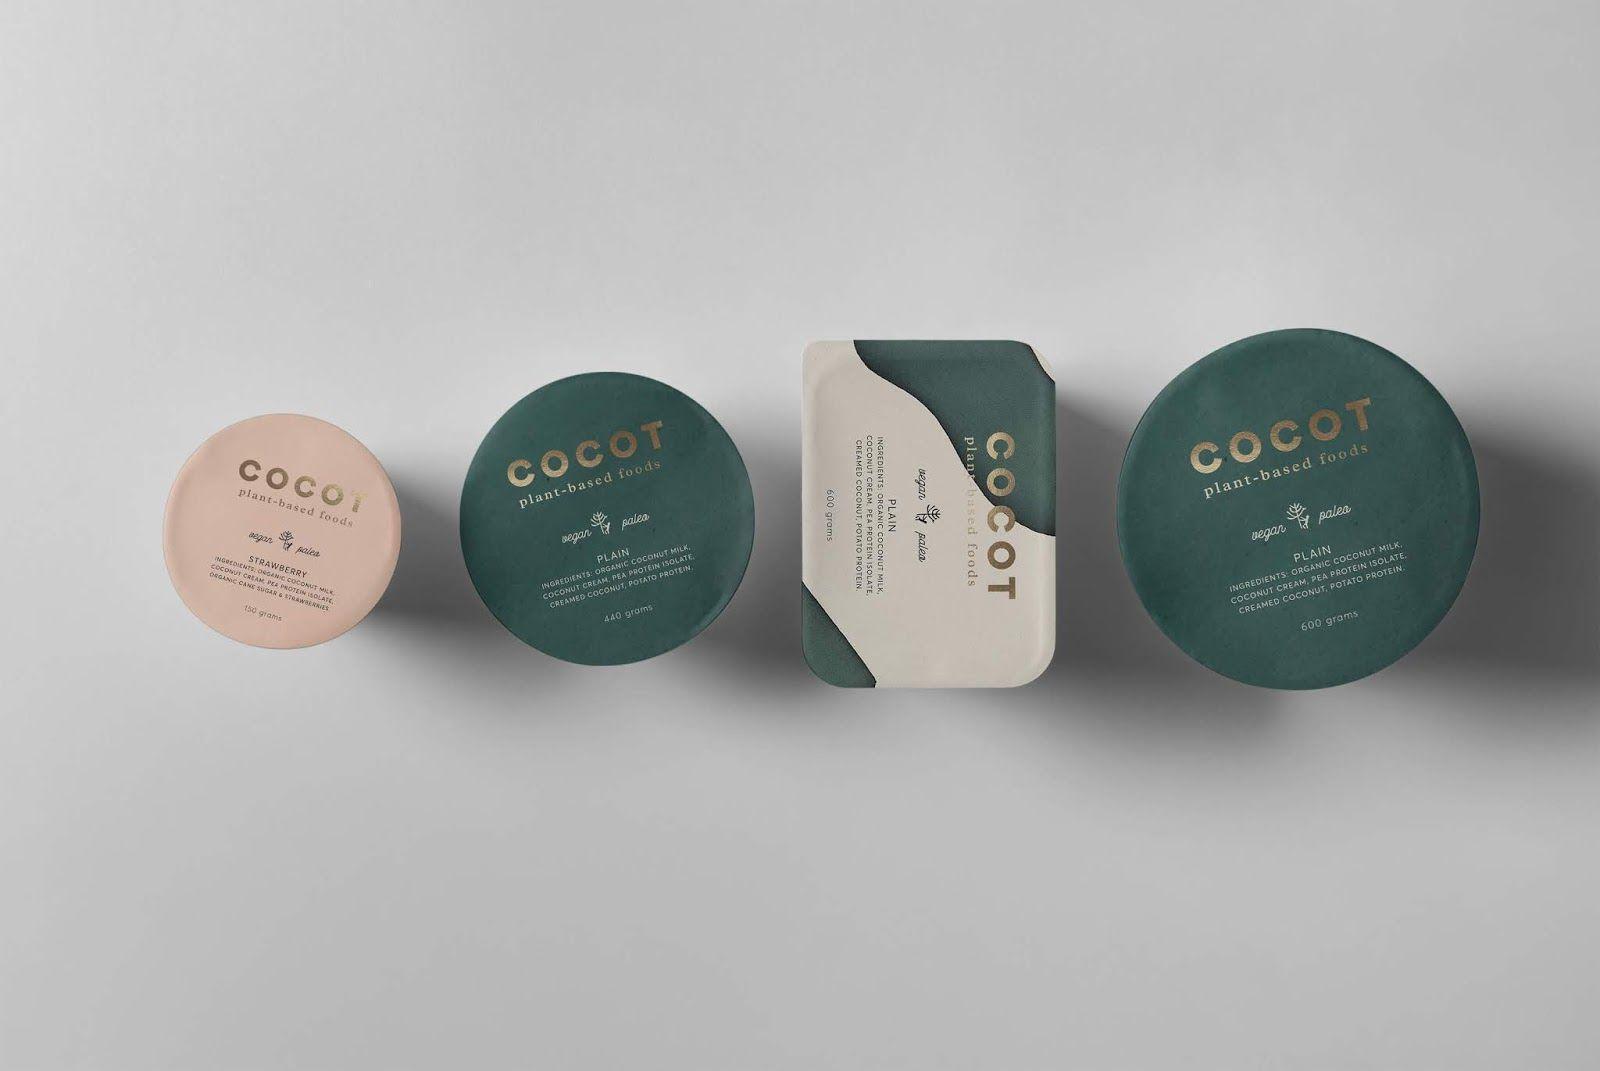 Cocot Packaging Packaging Design Design Packaging Design